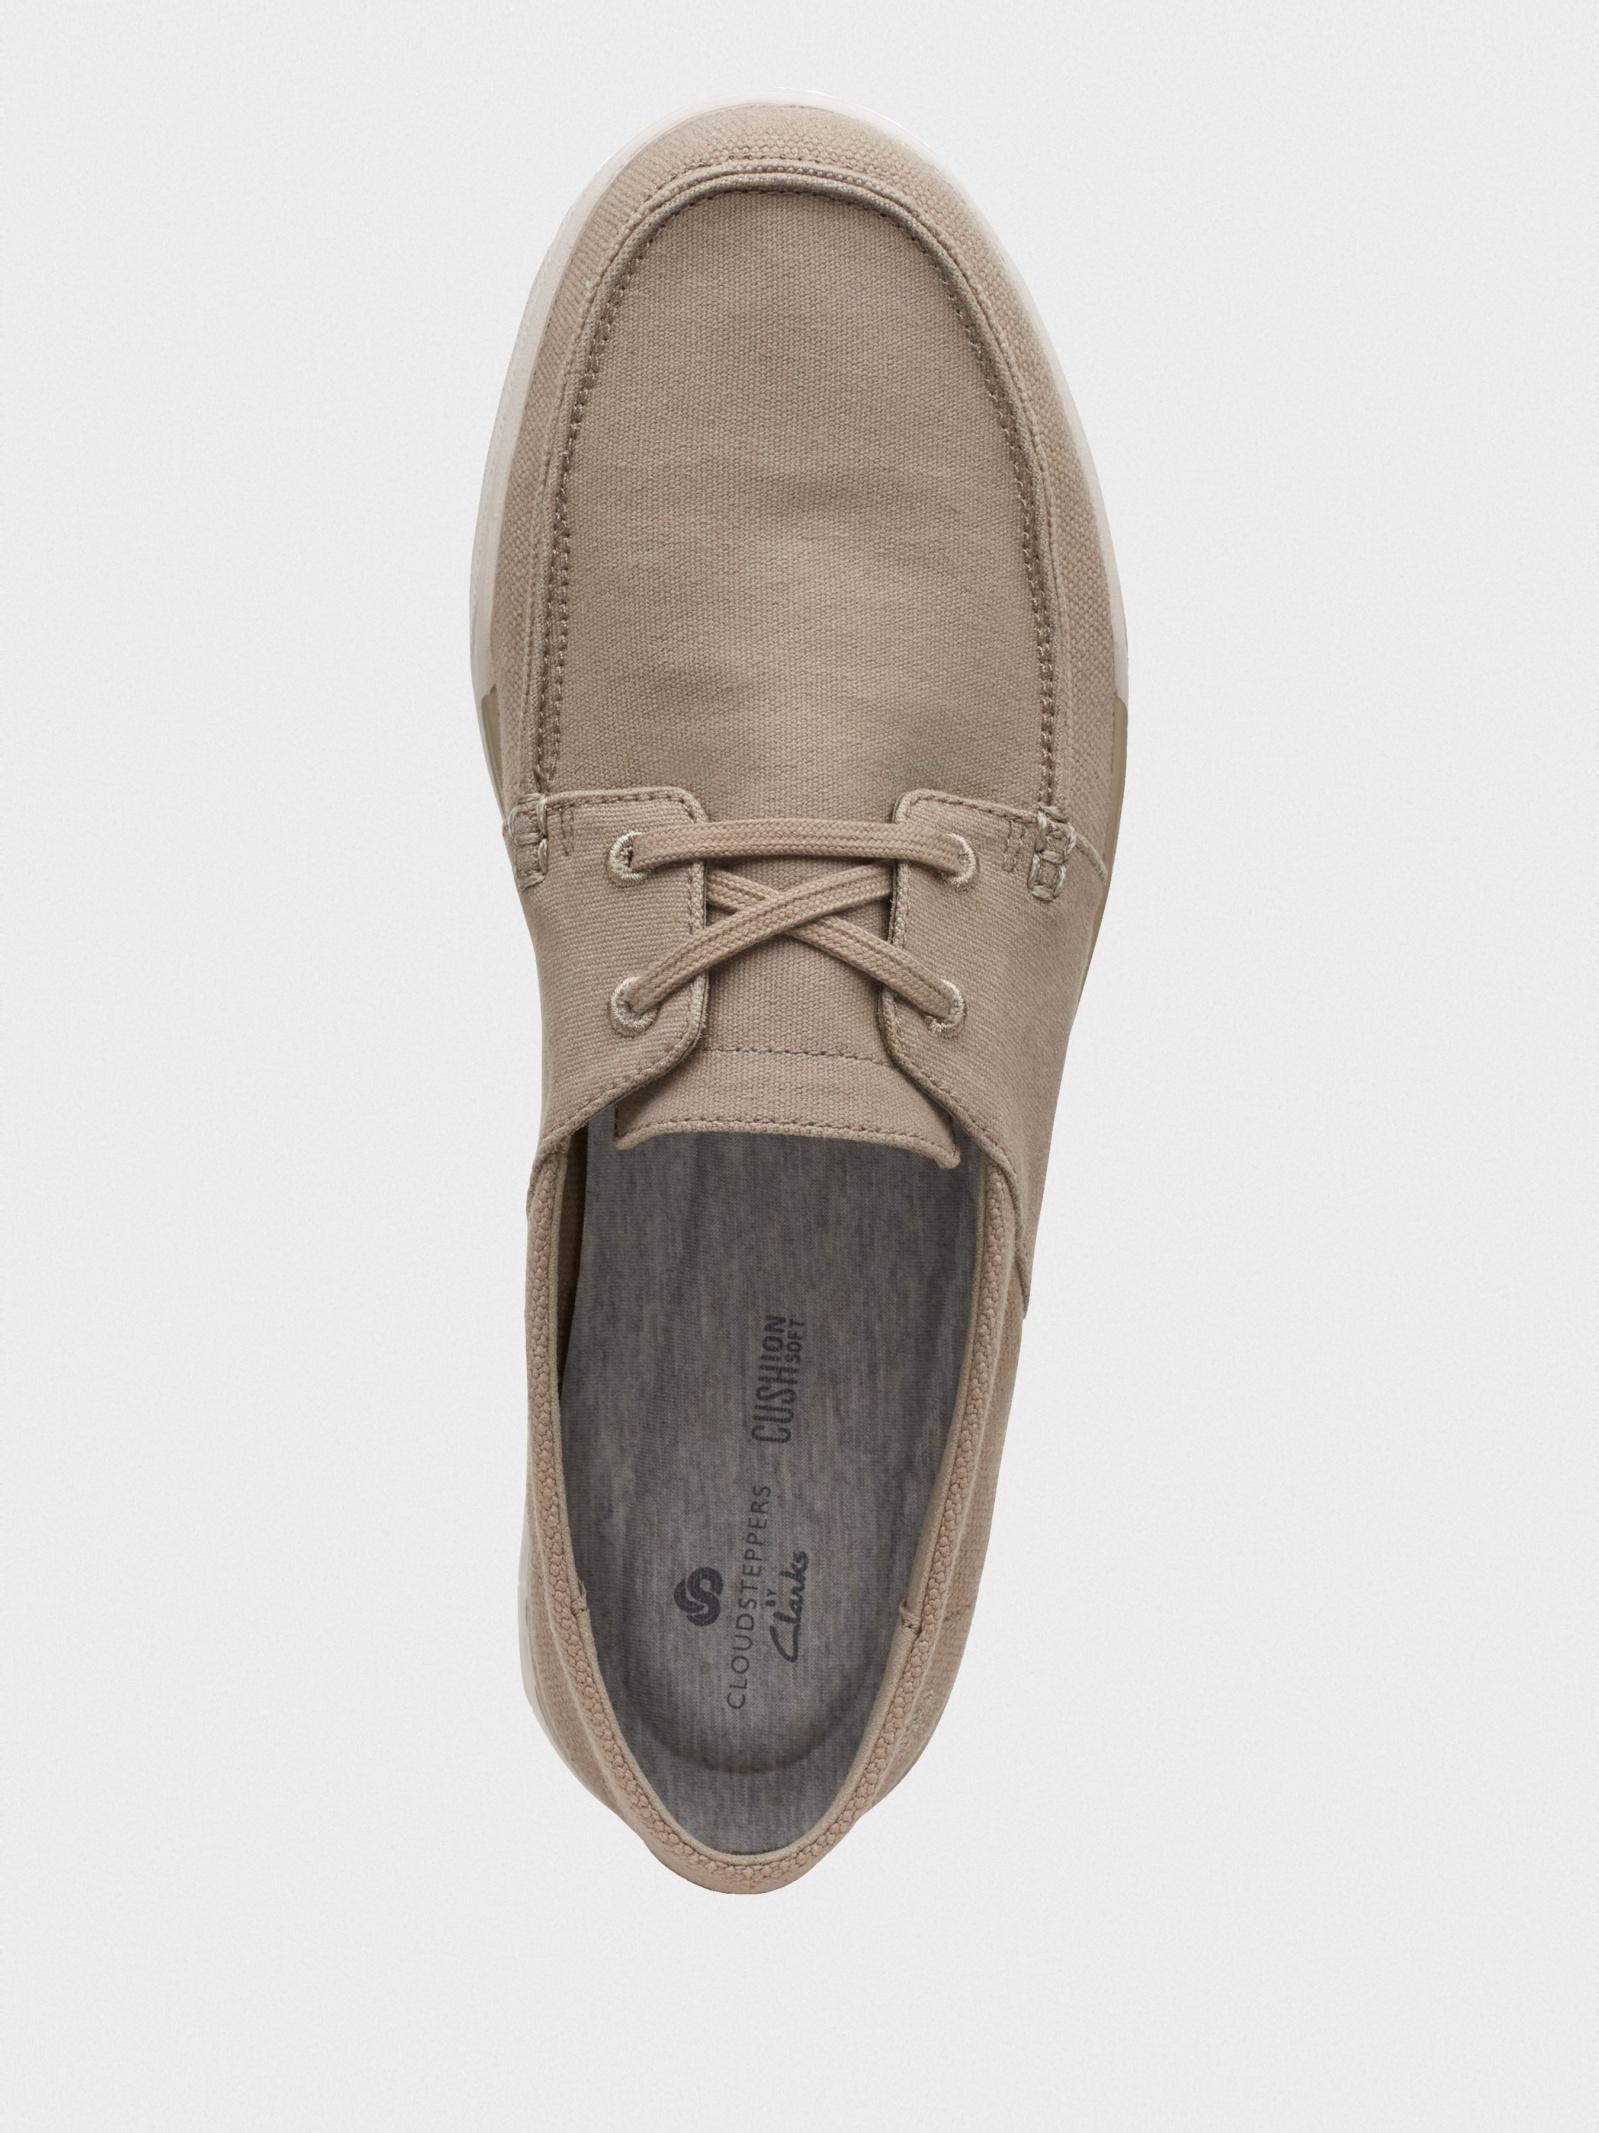 Мокасины для мужчин Clarks Step Isle Base 2614-8969 брендовая обувь, 2017